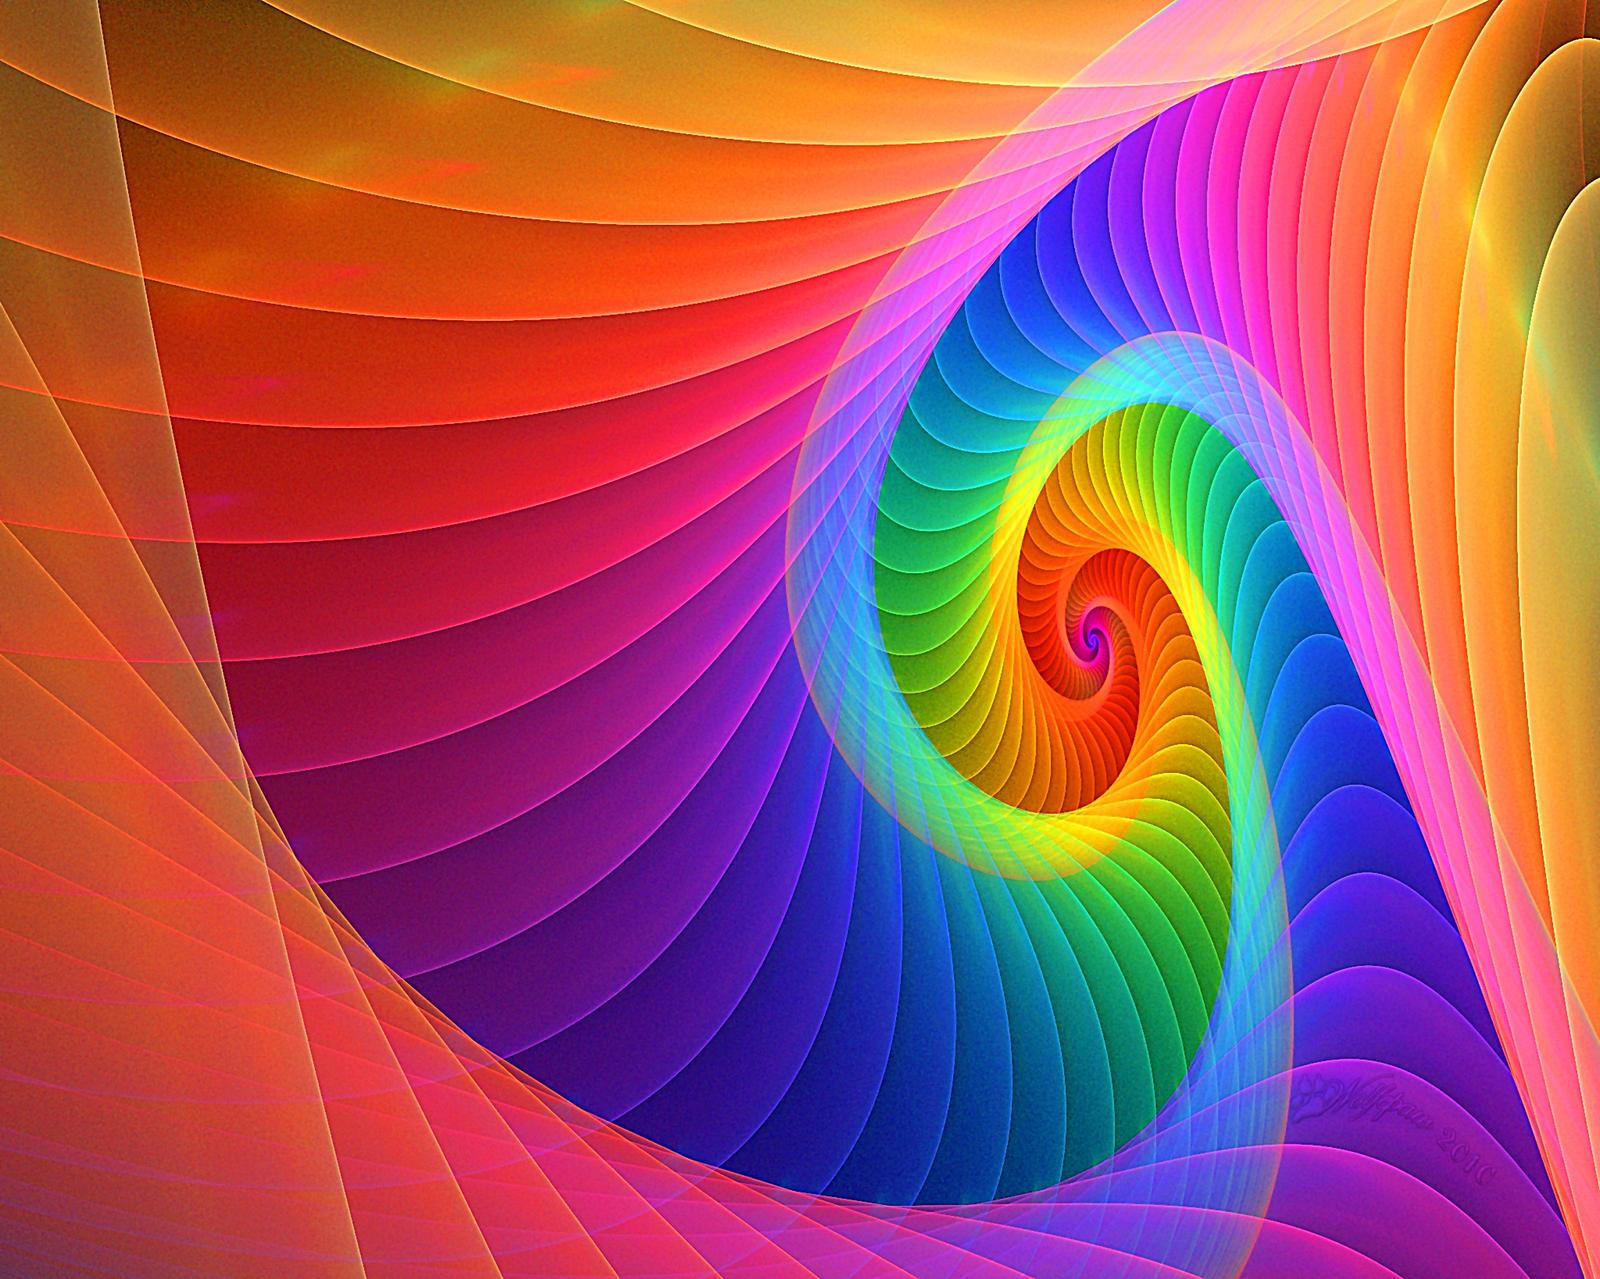 spiral rainbow - photo #16